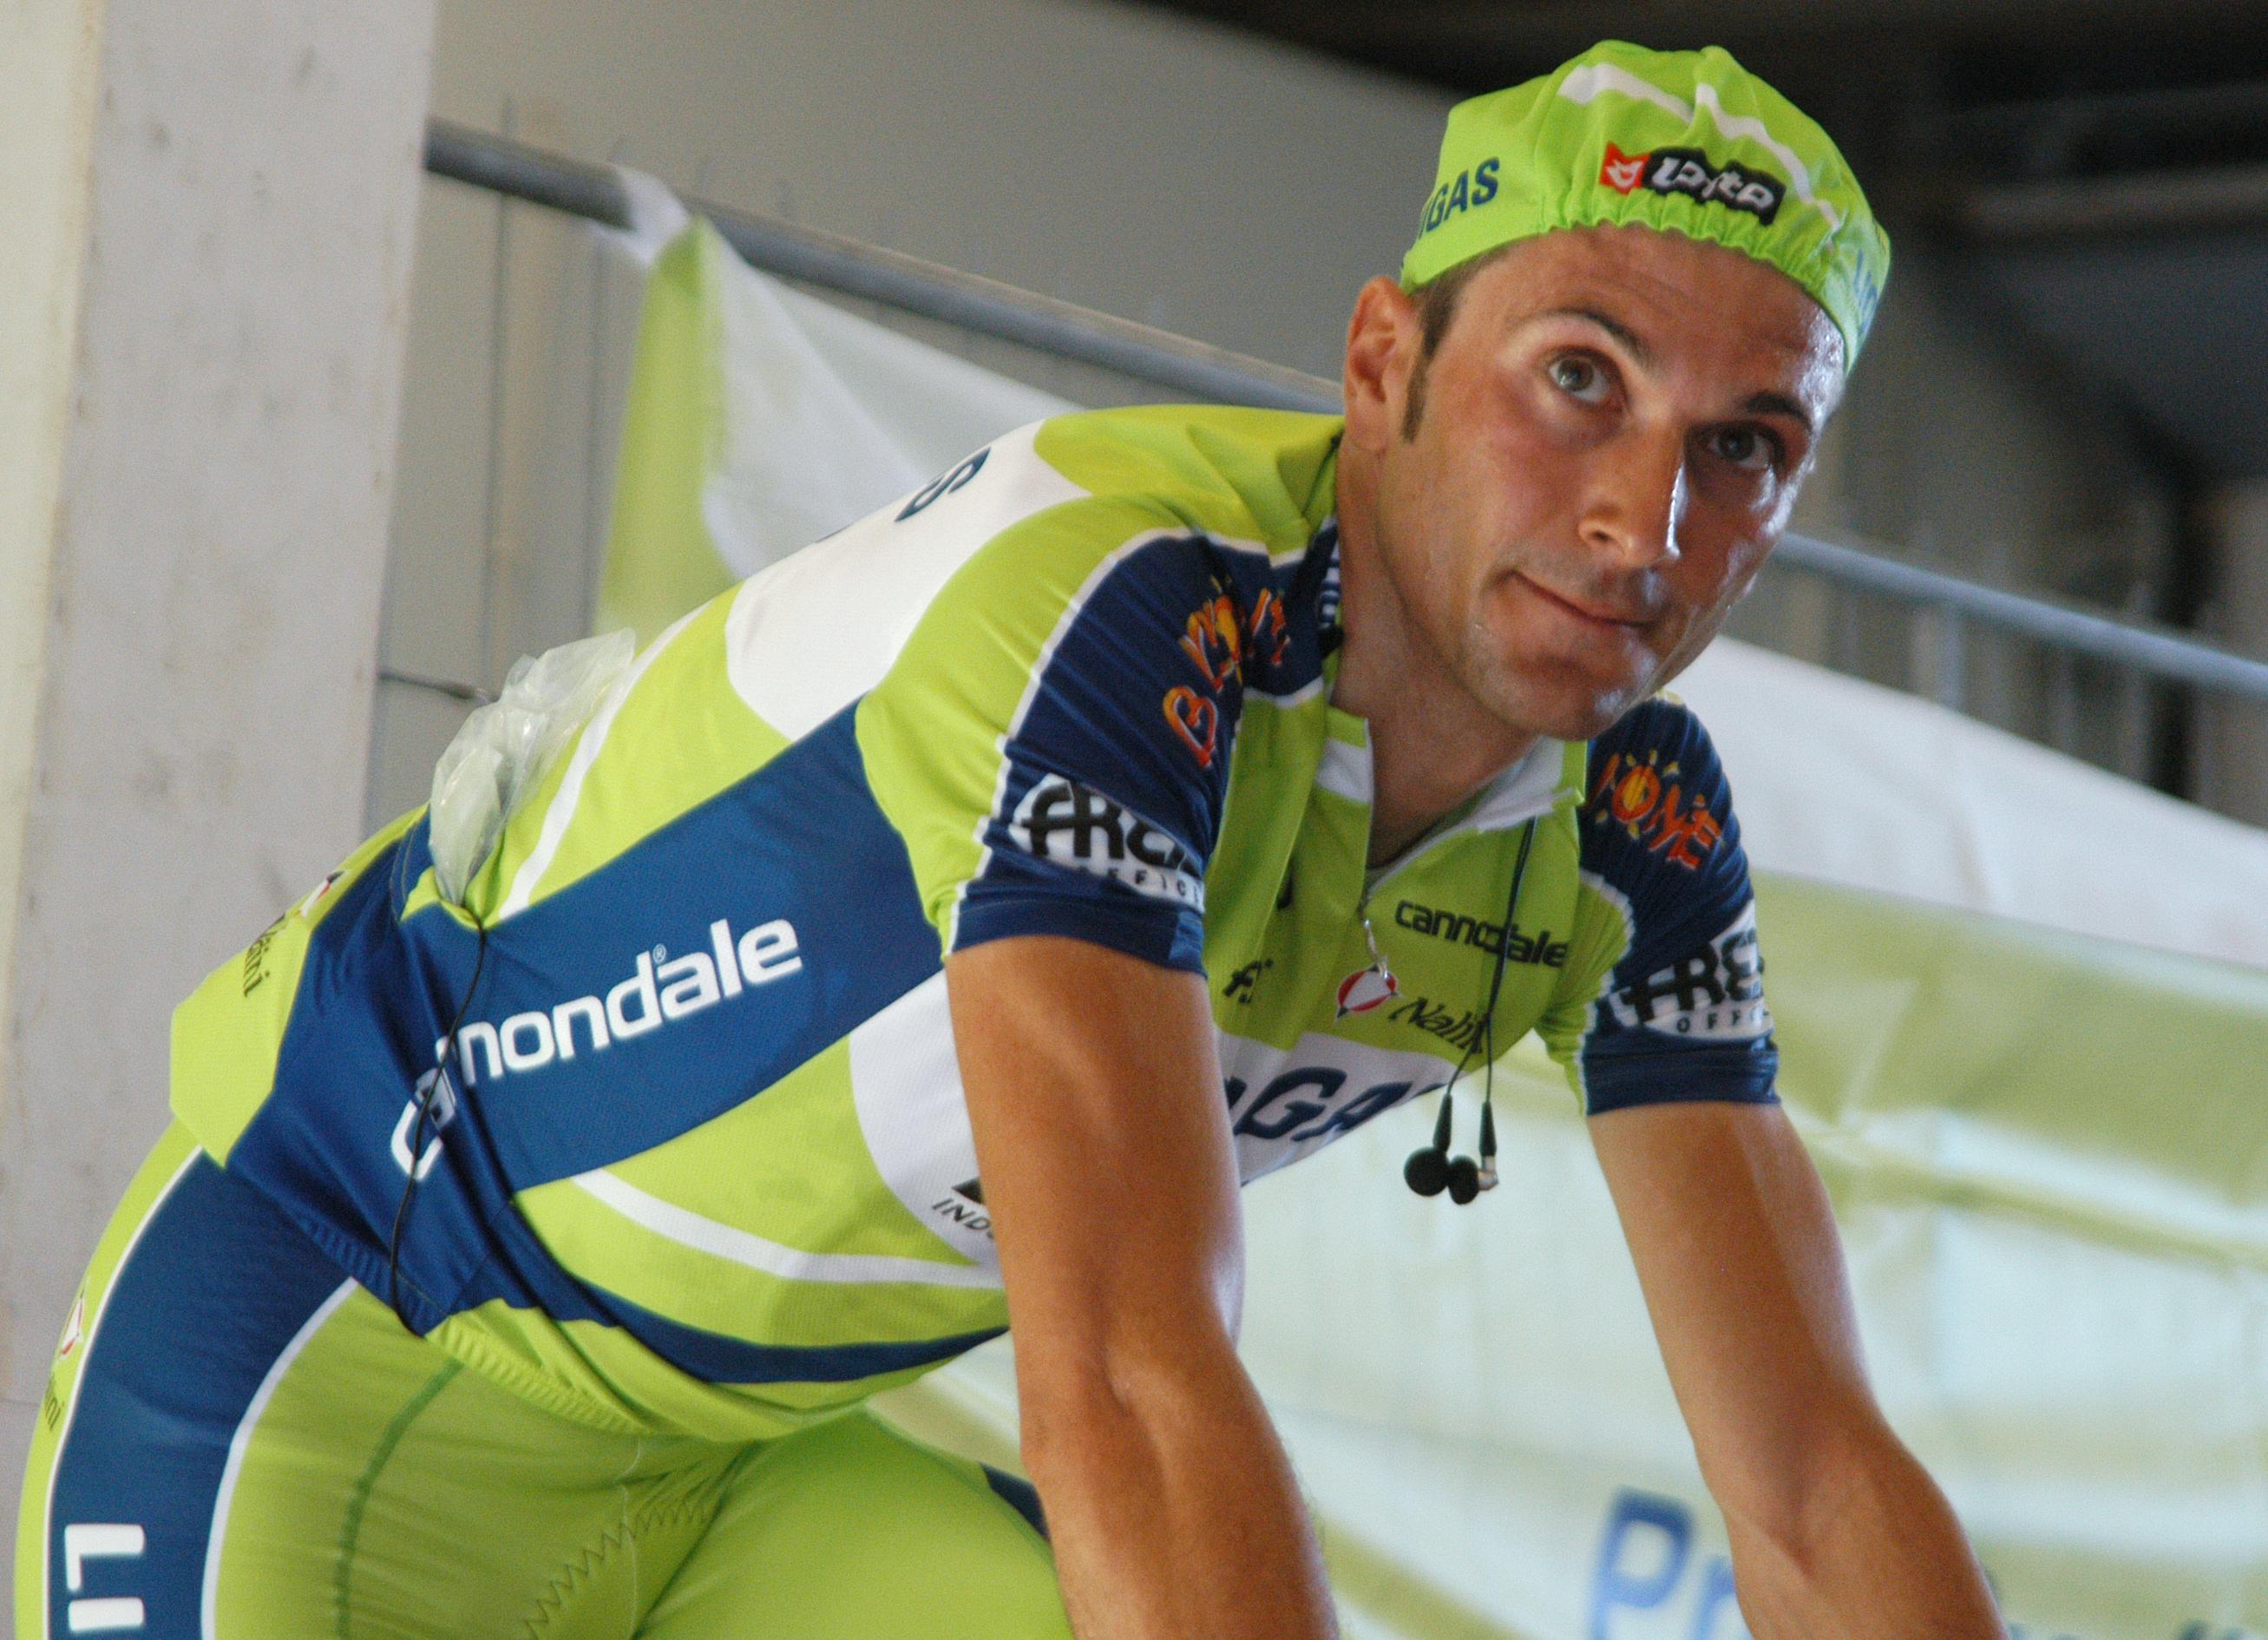 Saxo-Tinkoff scatenata: dopo Sagan, ecco Ivan Basso